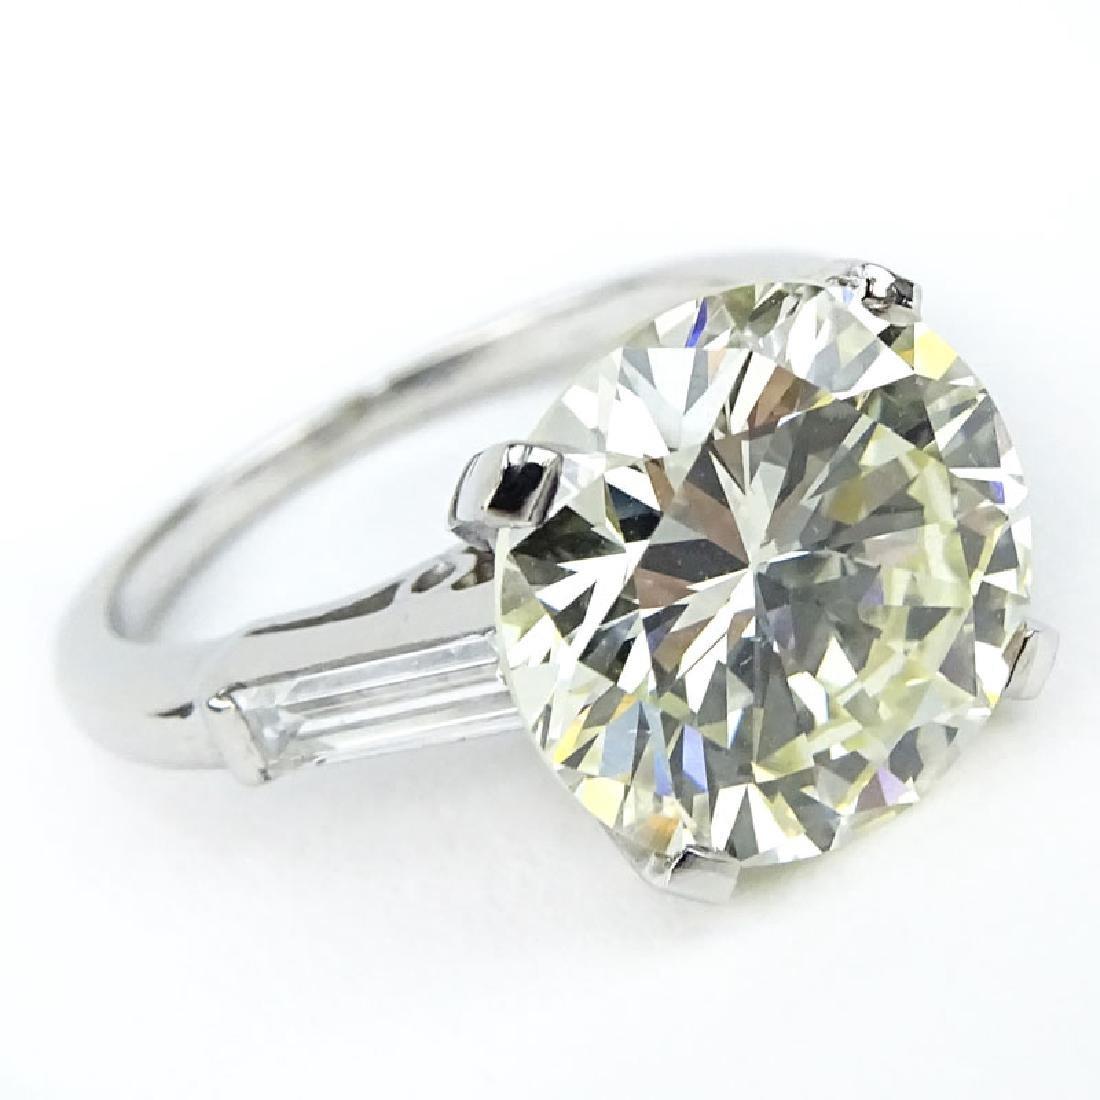 Vintage Approx. 4.87 Carat Round Brilliant Cut Diamond